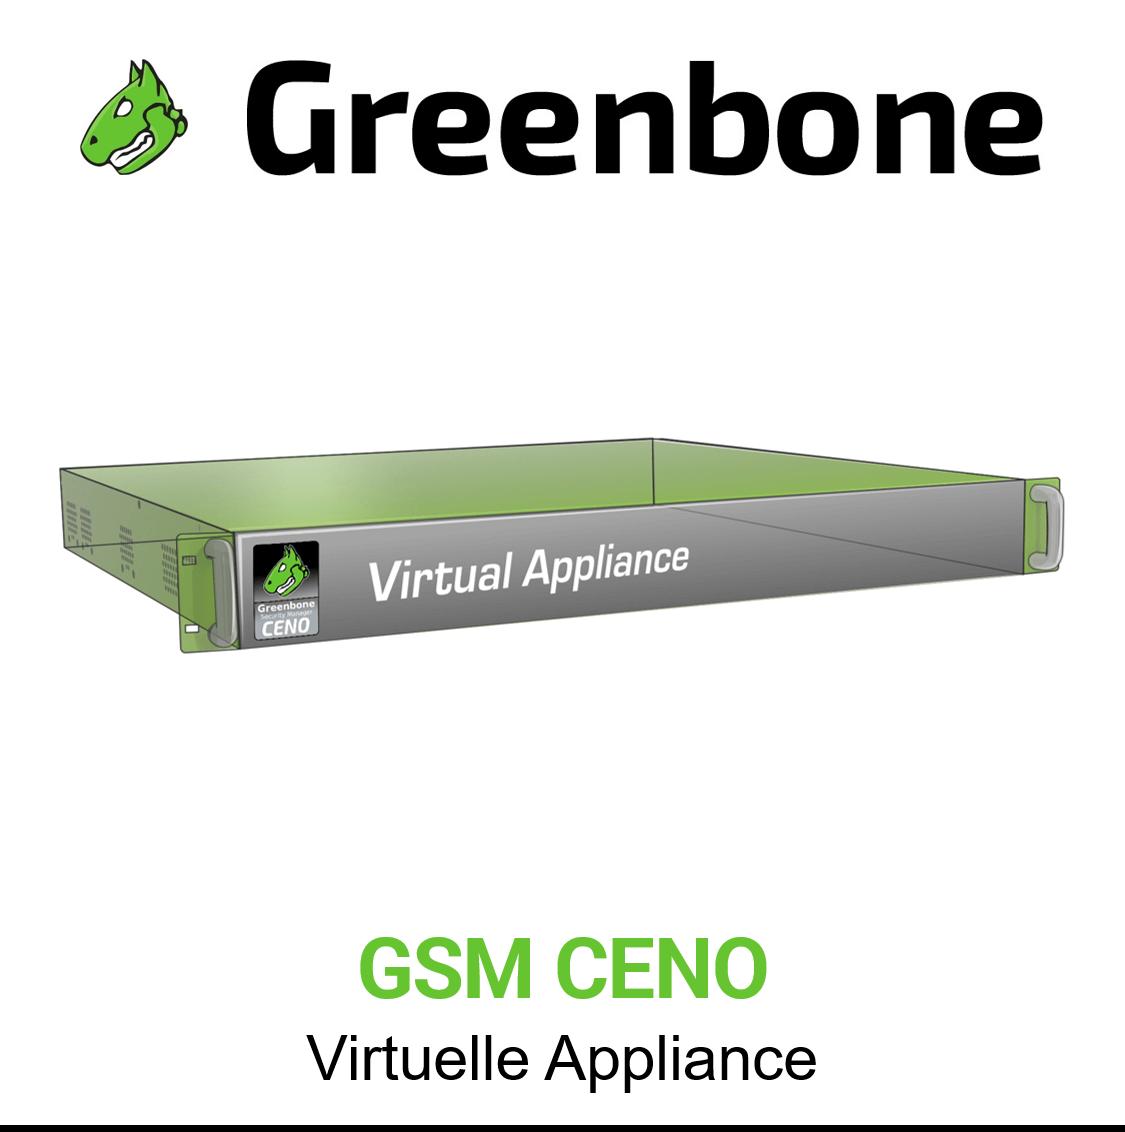 Greenbone GSM CENO Virtuelle Appliance